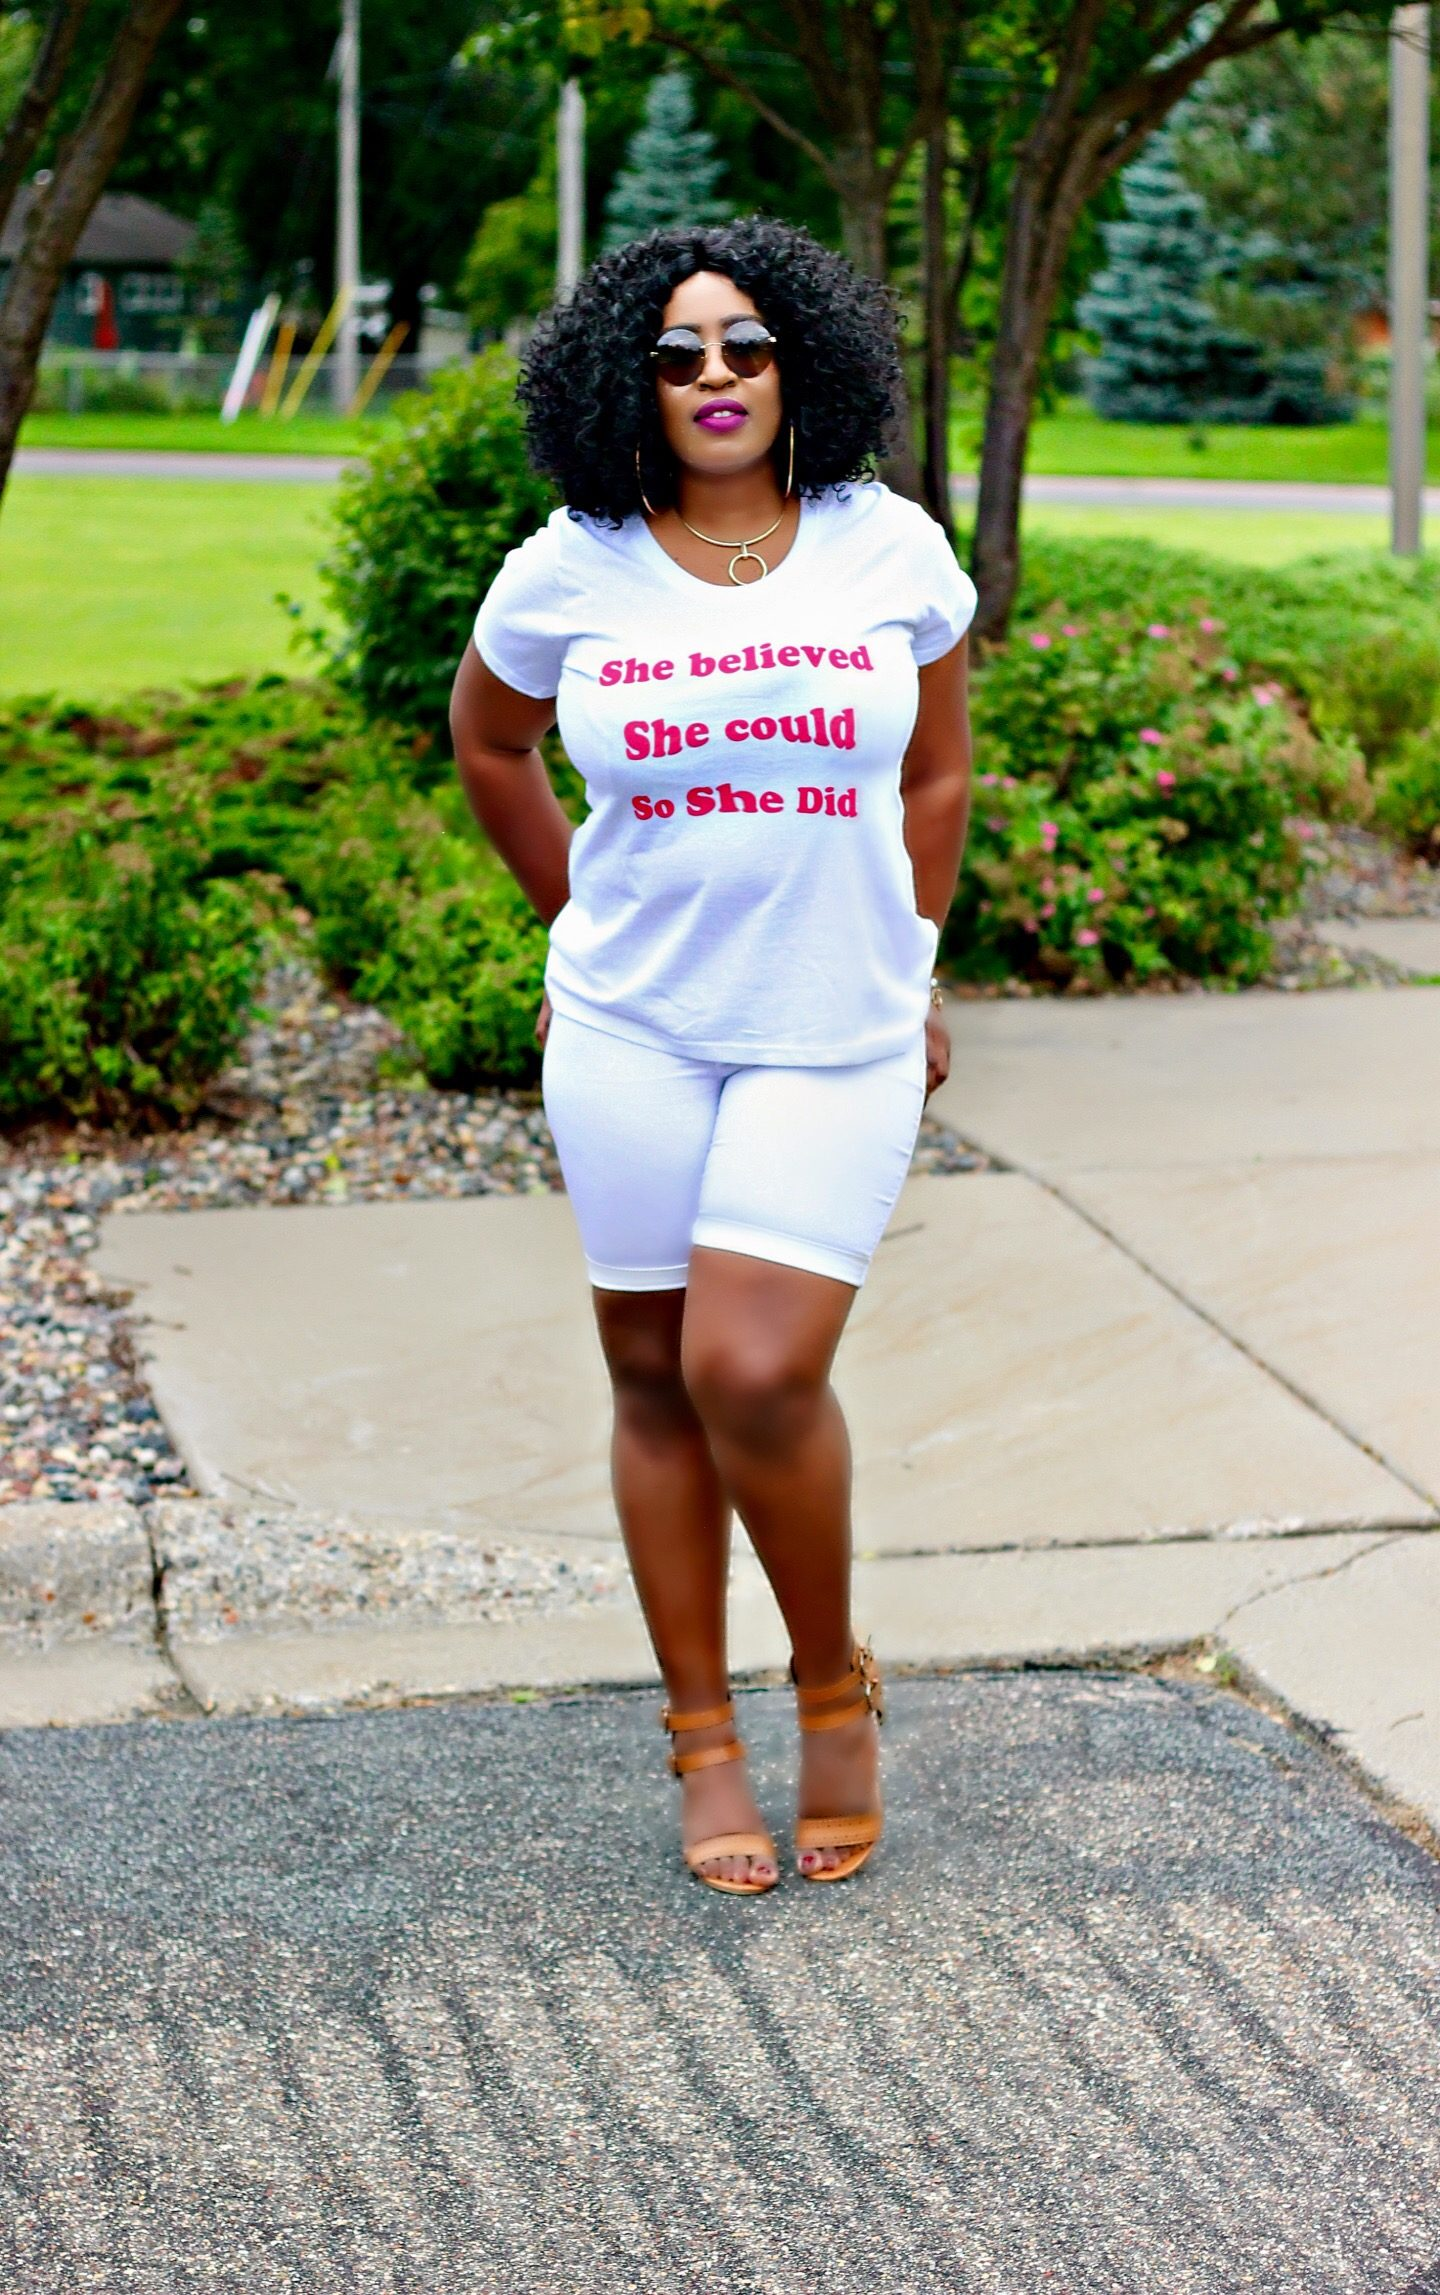 CUSTOMized-girl-shirts